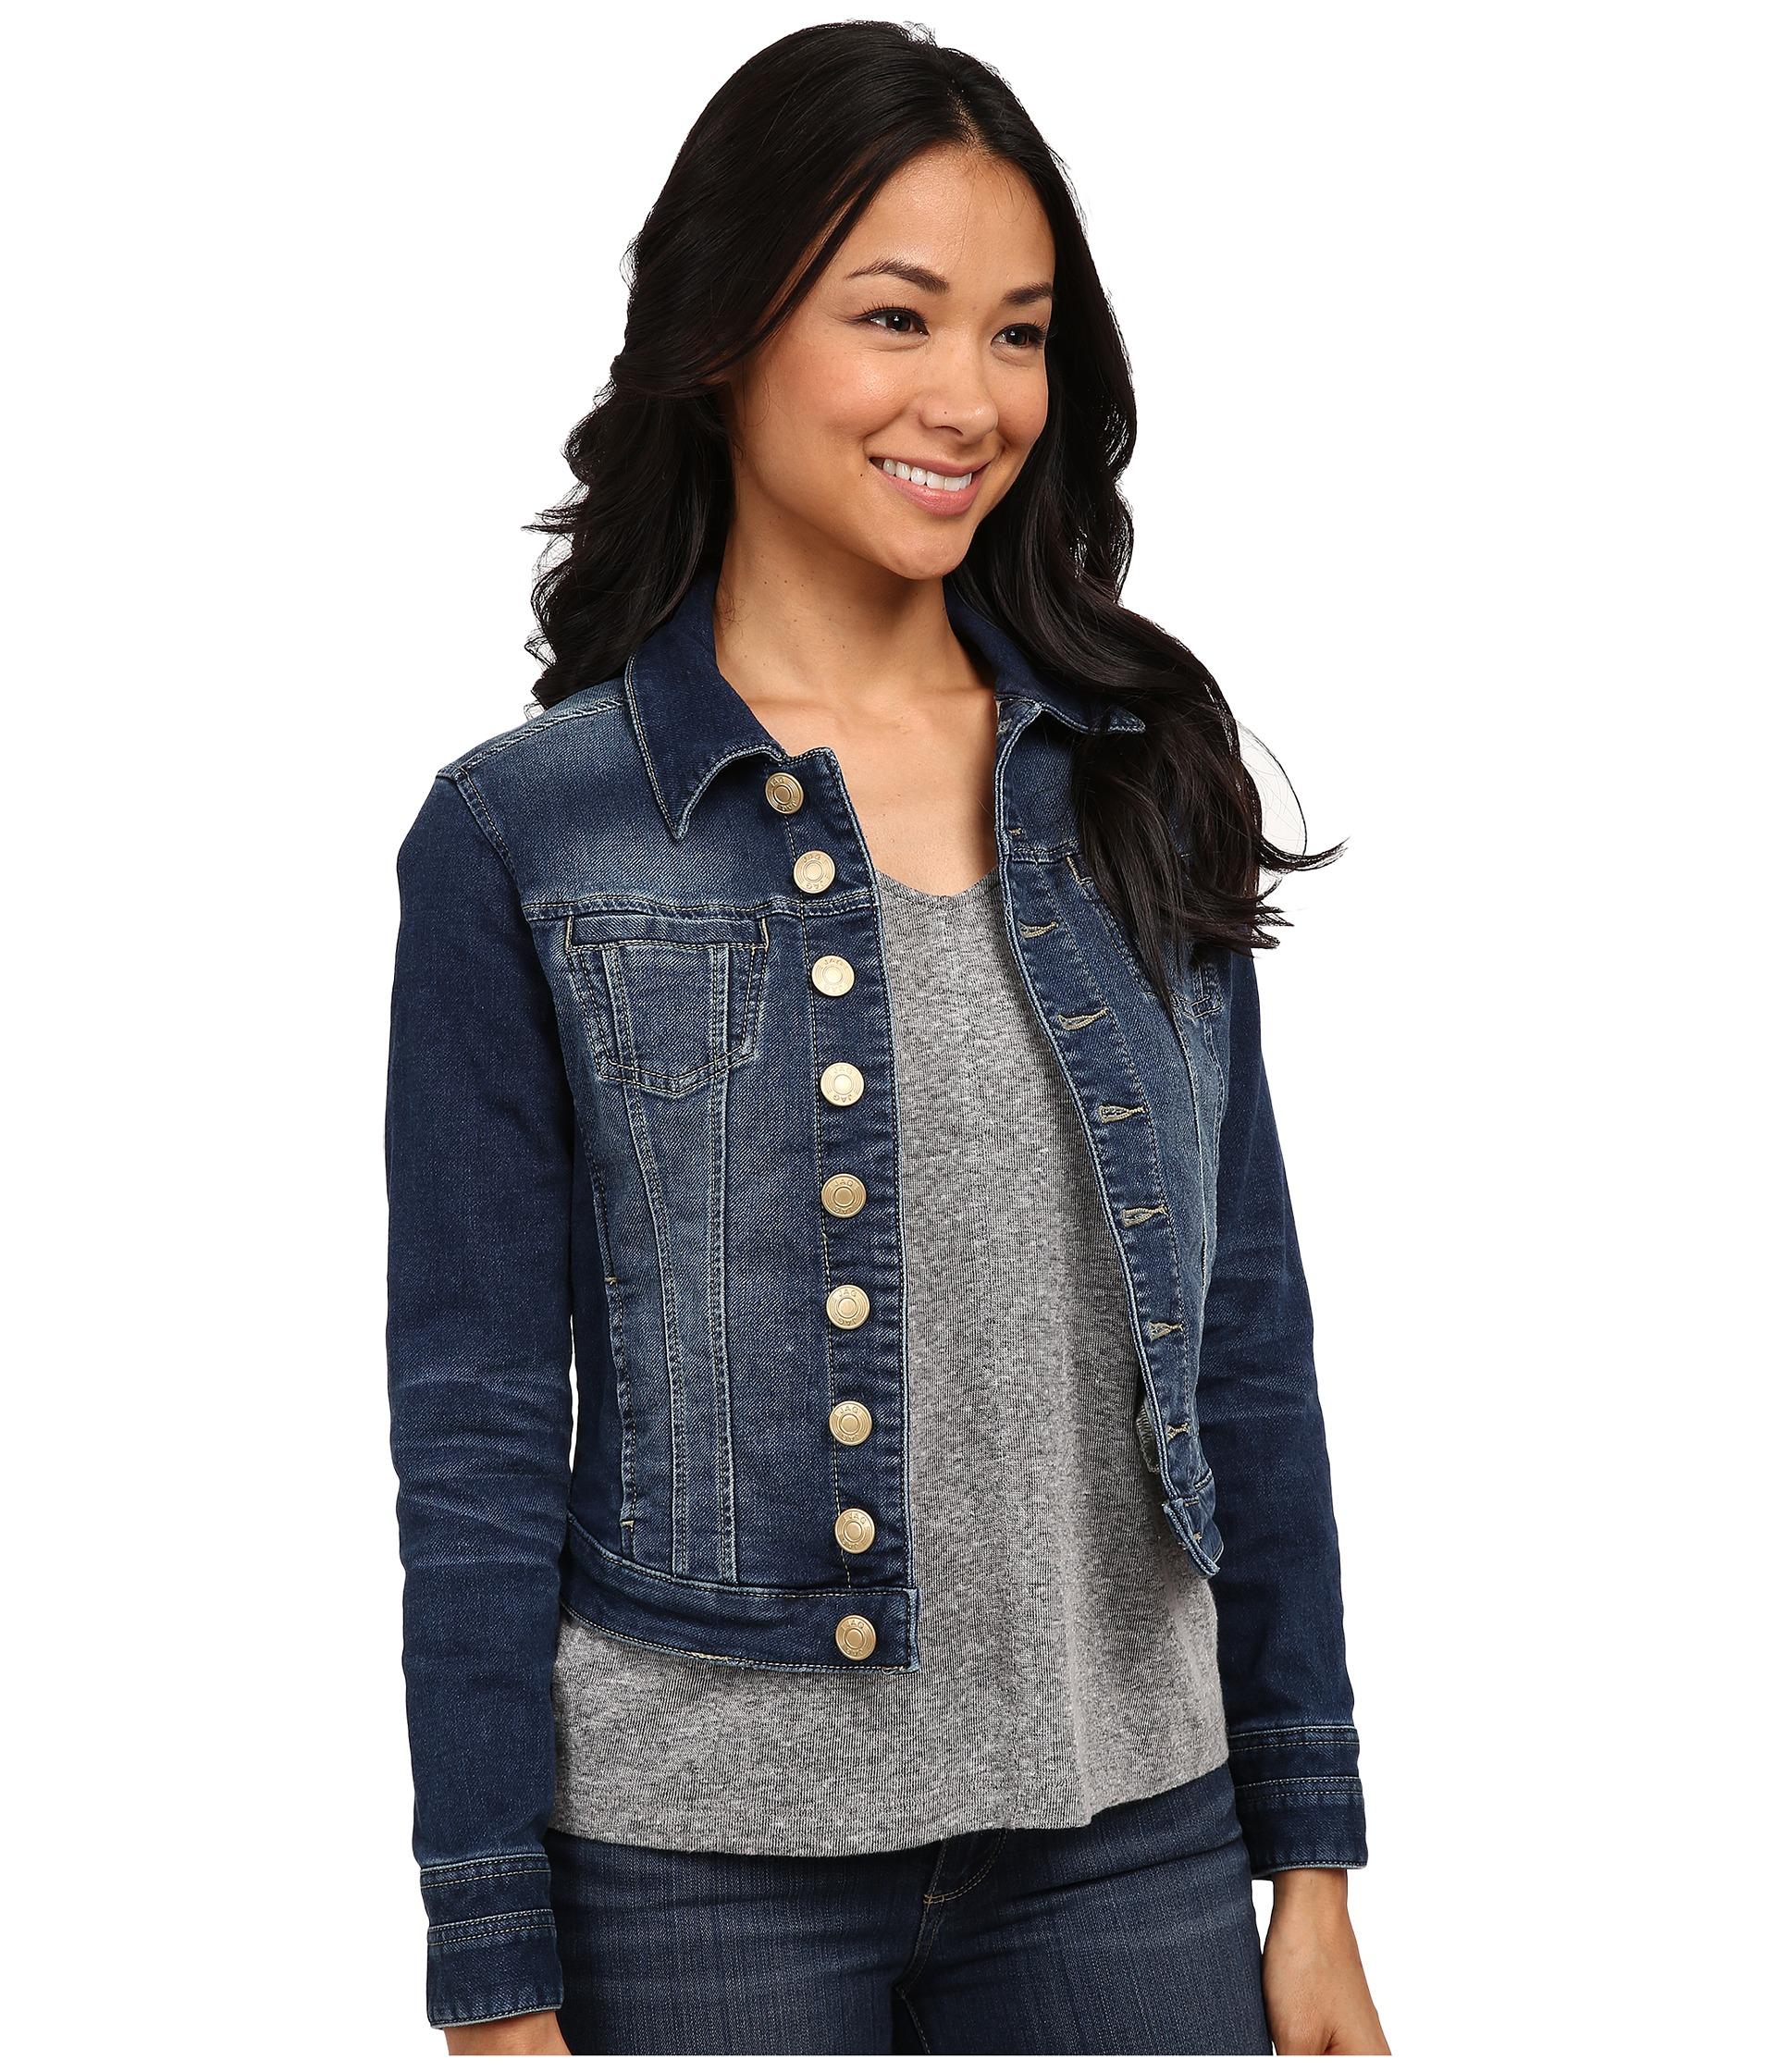 Jag Jeans Petite Petite Savannah Jacket in Forever Blue Knit Denim at Zappos.com